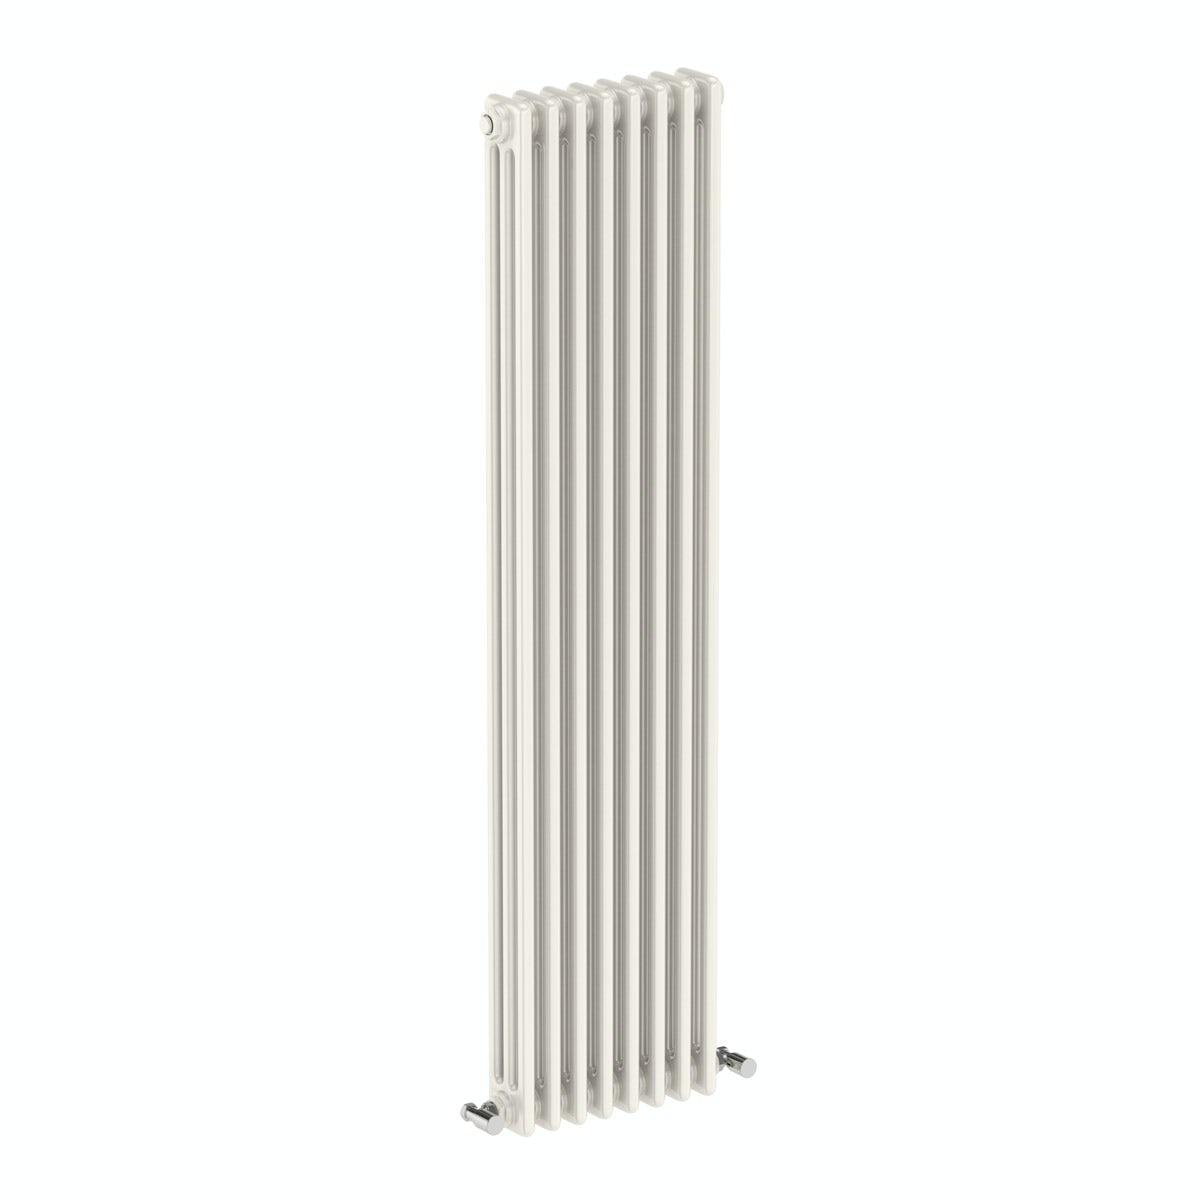 The Bath Co. Dulwich vertical white triple column radiator 1500 x 380